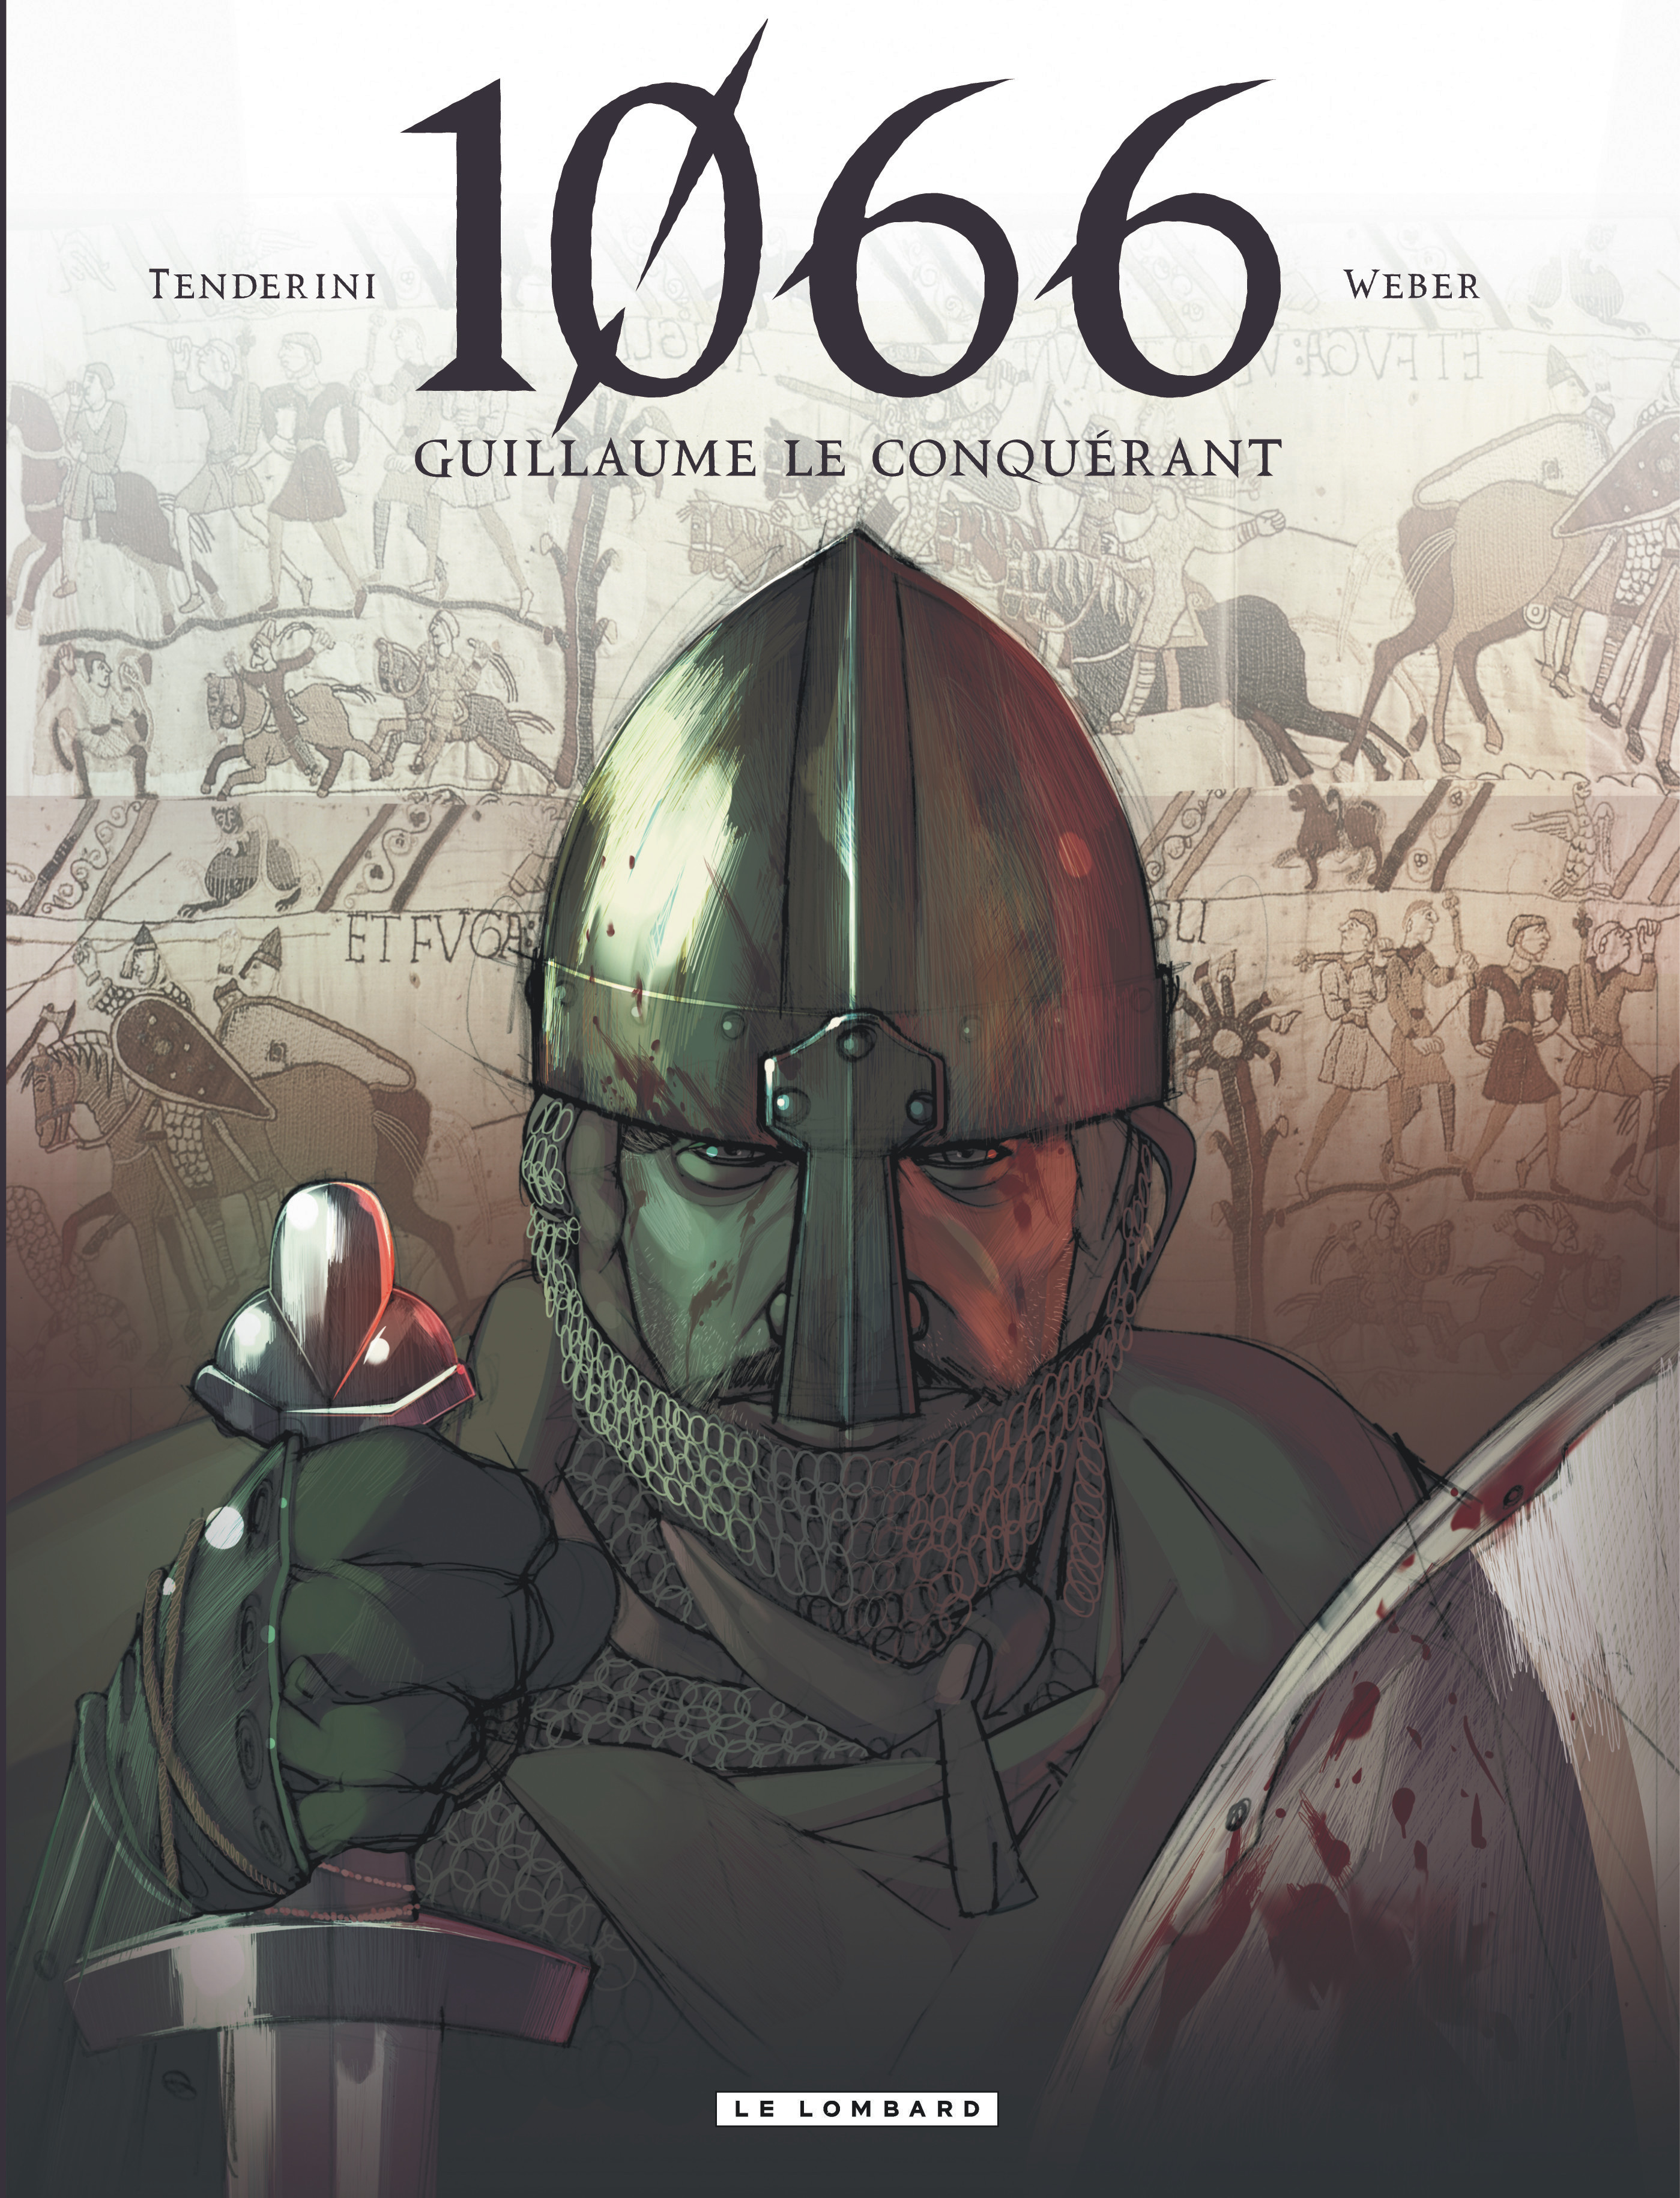 1066 - TOME 1 - 1066 - GUILLAUME LE CONQUERANT